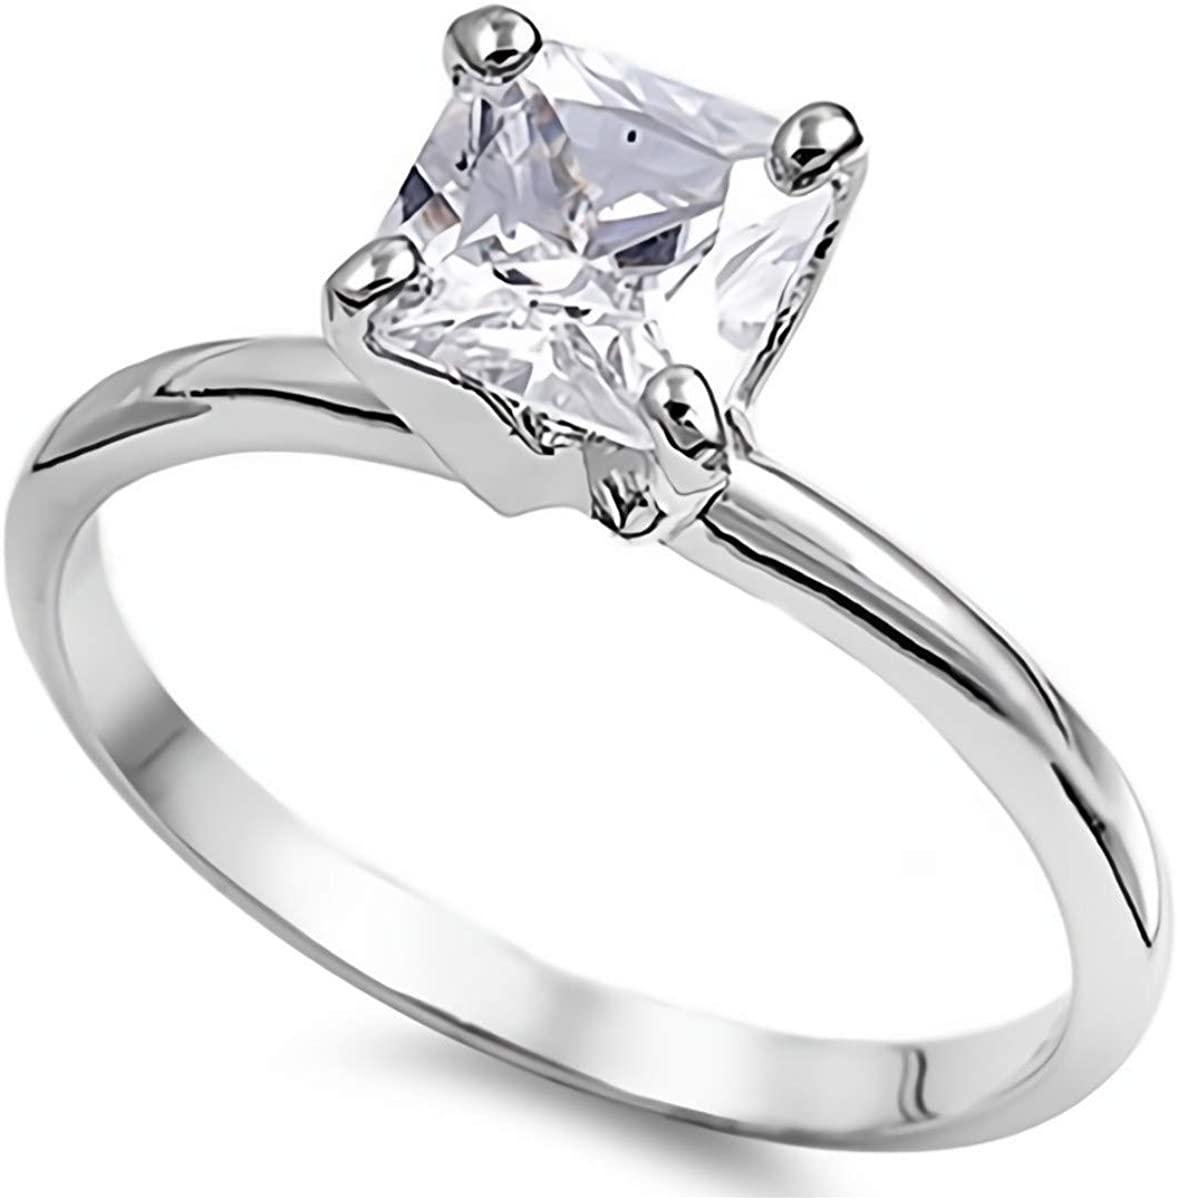 Glitzs Jewels 925 Sterling Silver CZ Ring (Clear)   Cubic Zirconia Jewelry Gift